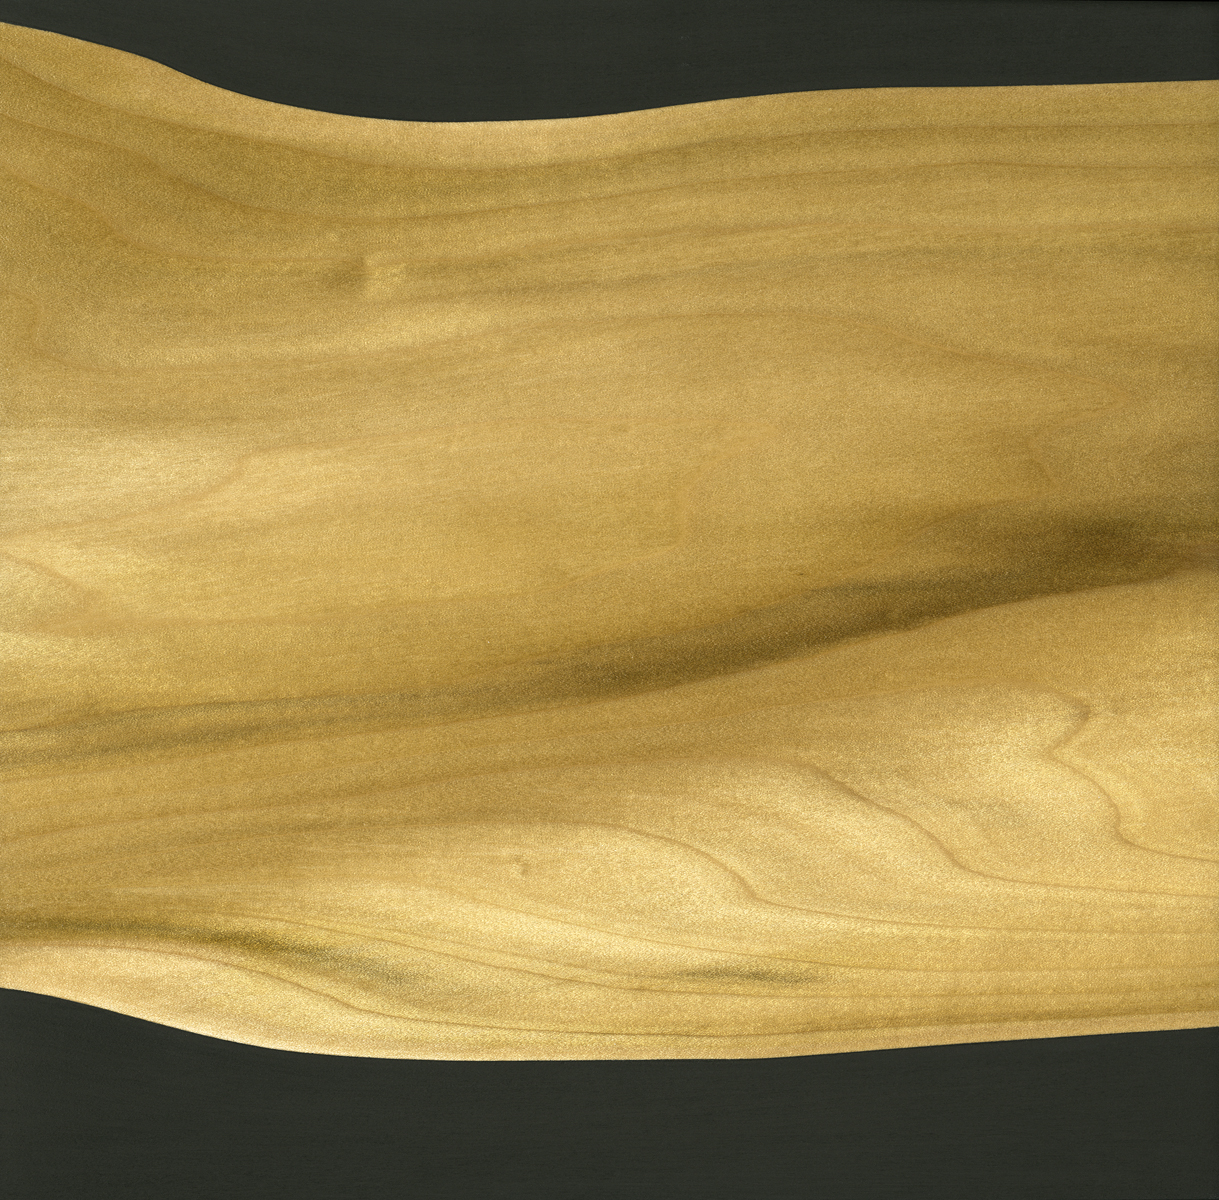 "Glossolalia (Prototype #1)  Gesso/Lacquer/Wood 9 ⅞"" x 9 ⅞"" x 1"" 2017"